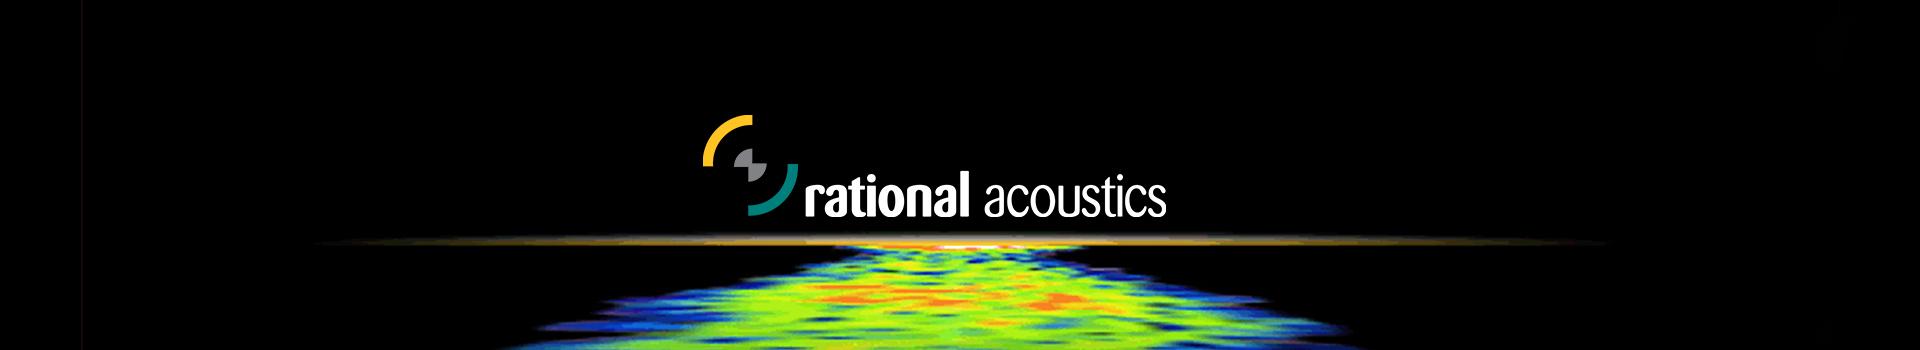 NMK GCC - Rational Acoustics